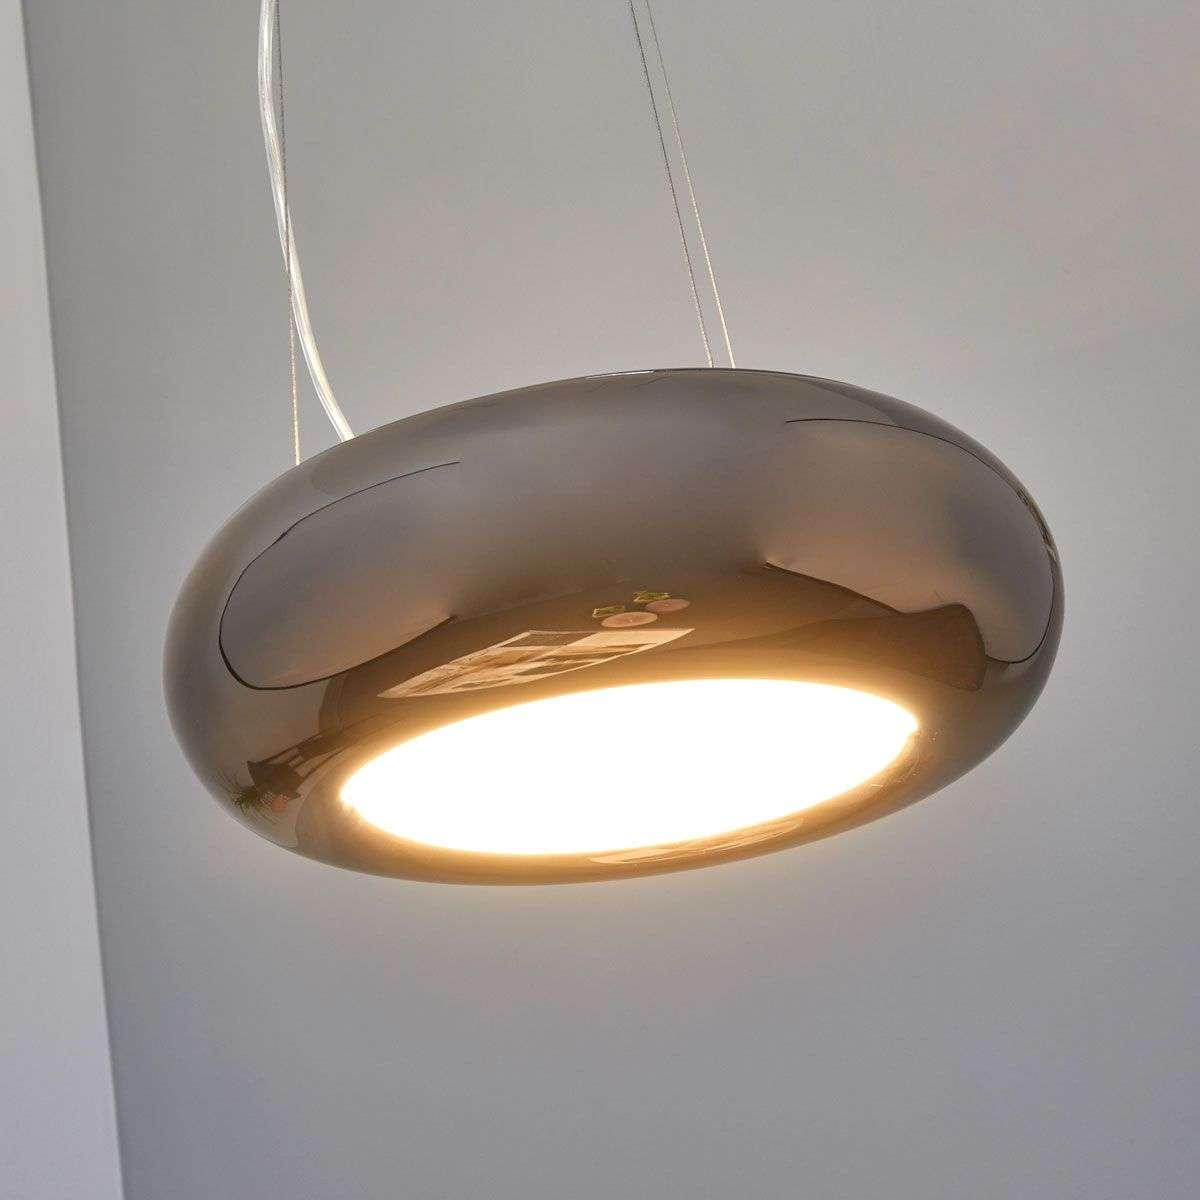 Glossy metal pendant light saina lights glossy metal pendant light saina 9639019 32 aloadofball Image collections